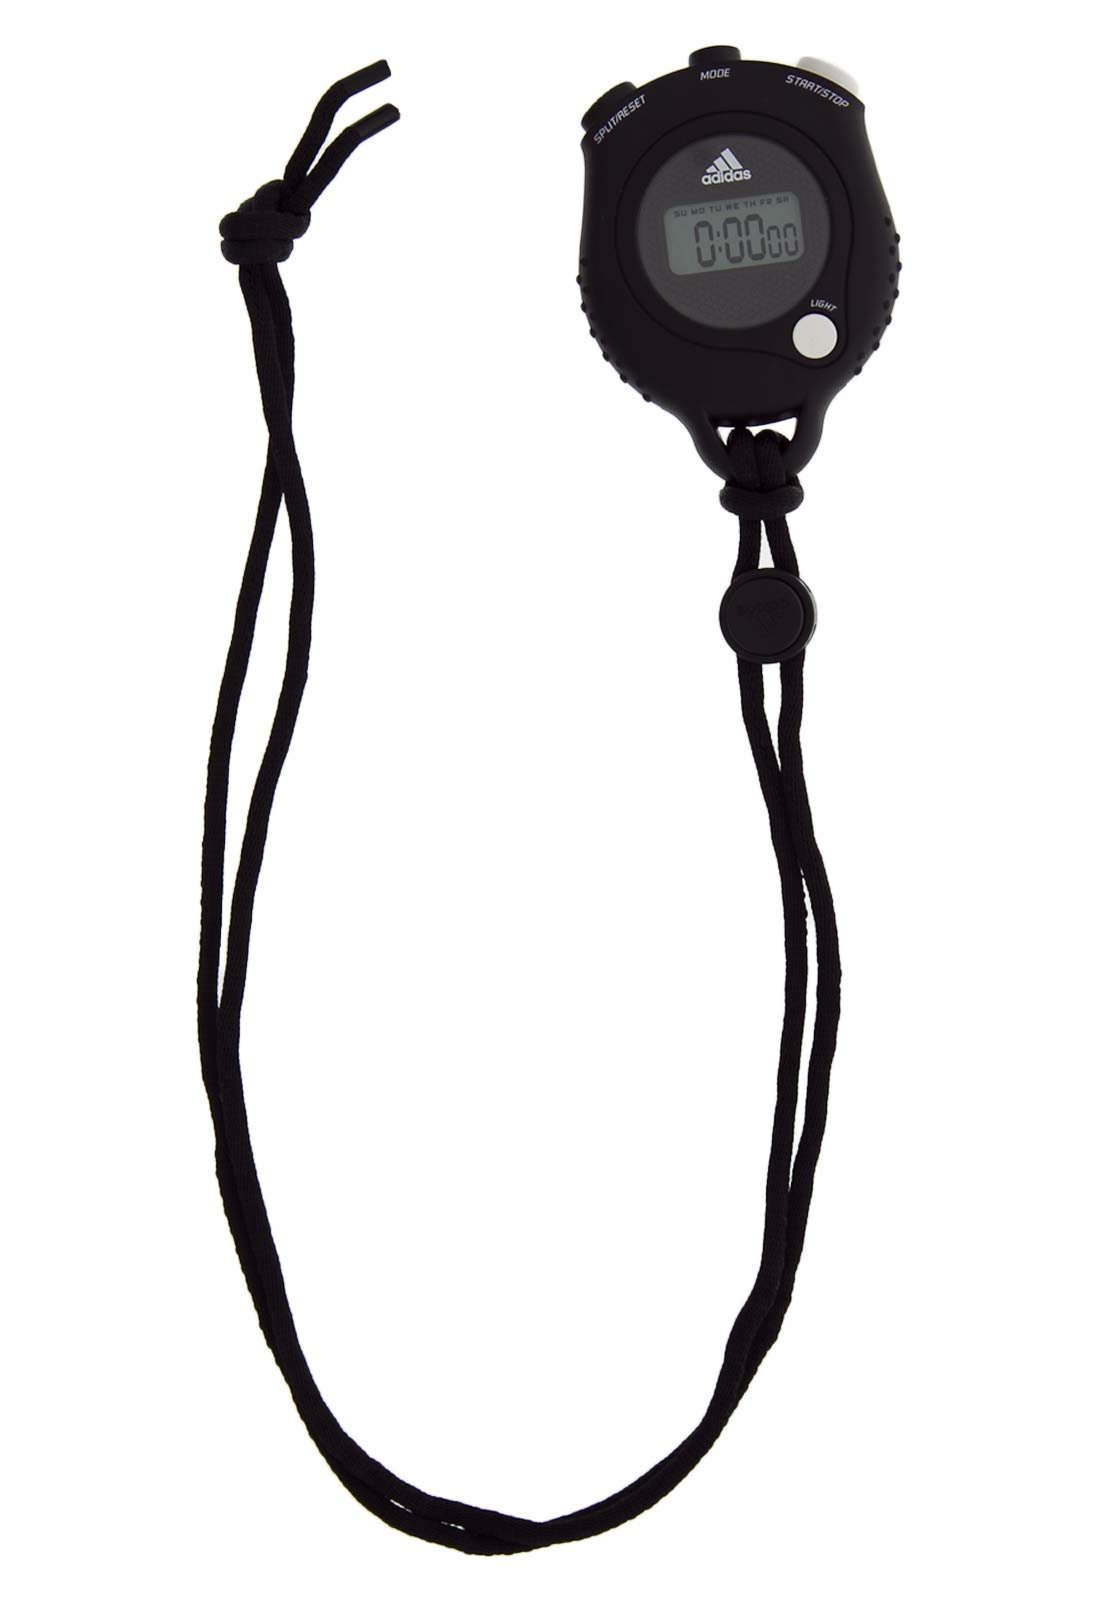 Error condensador Reembolso  Cronómetro adidas ADP3043N Preto - Compre Agora   Dafiti Brasil